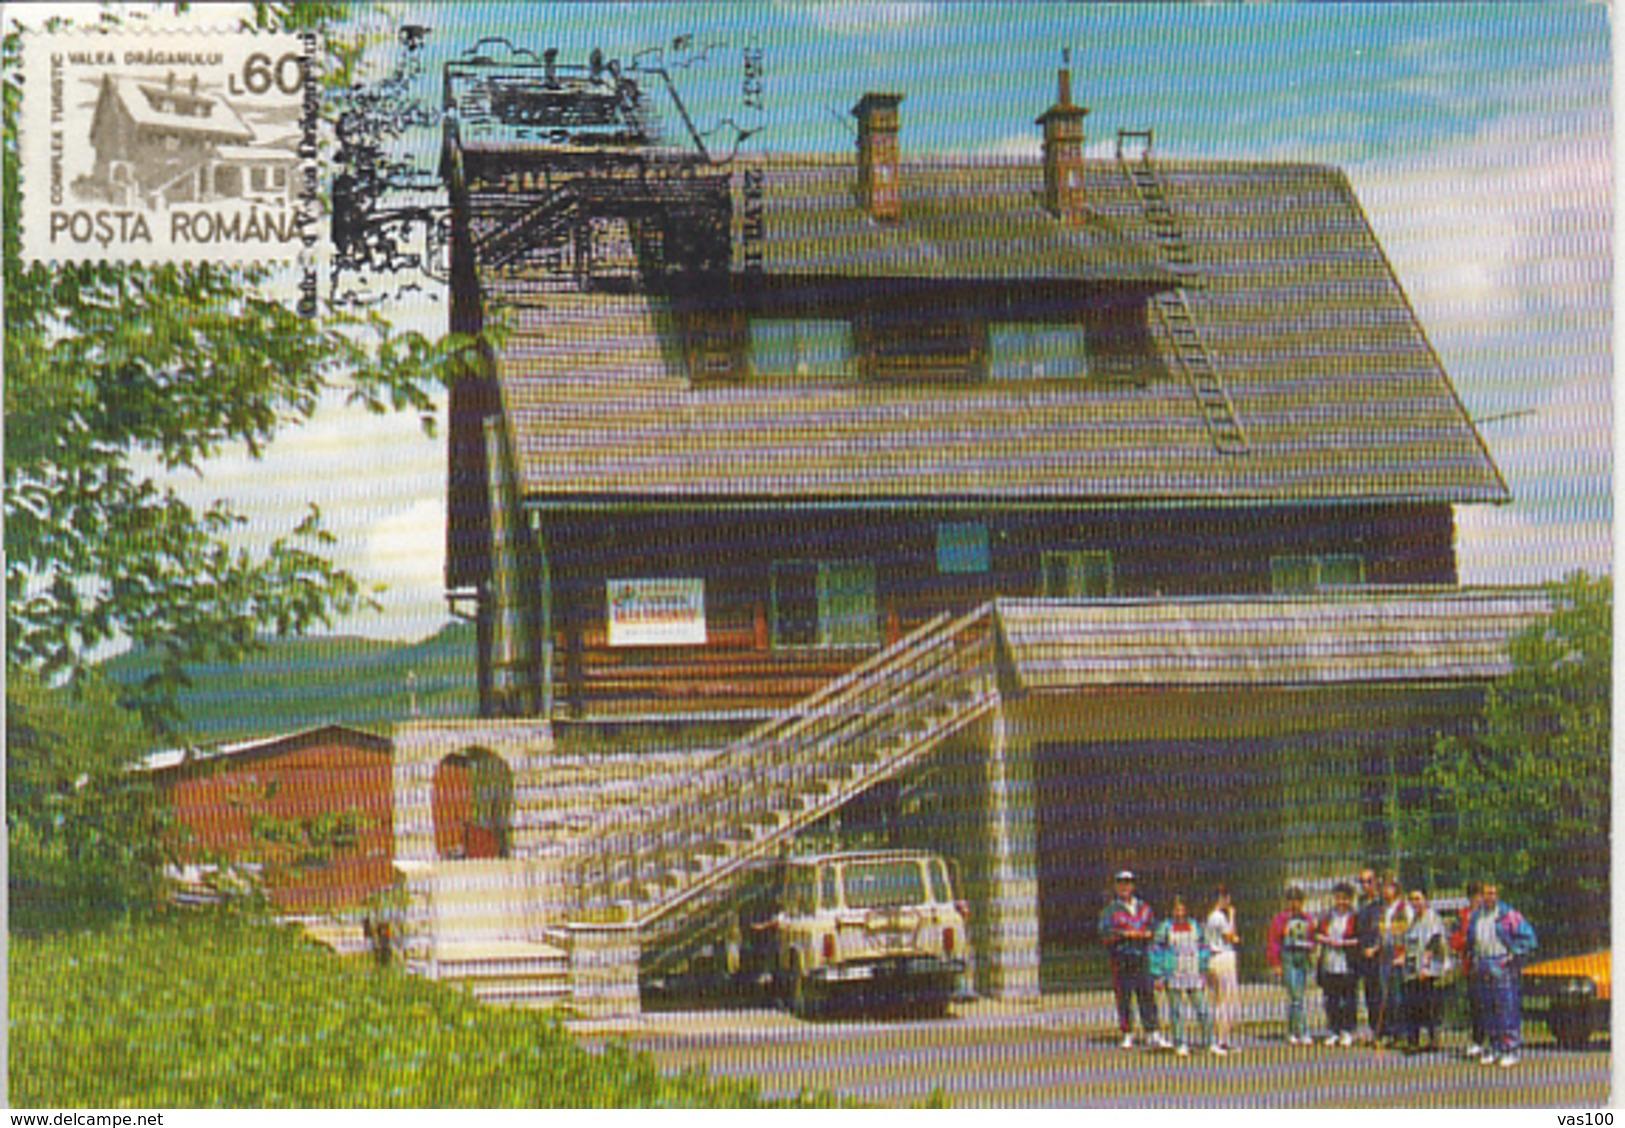 TOURISM, VALEA DRAGANULUI TOURISTICAL COMPLEX, CM, MAXICARD, CARTES MAXIMUM, 1993, ROMANIA - Holidays & Tourism